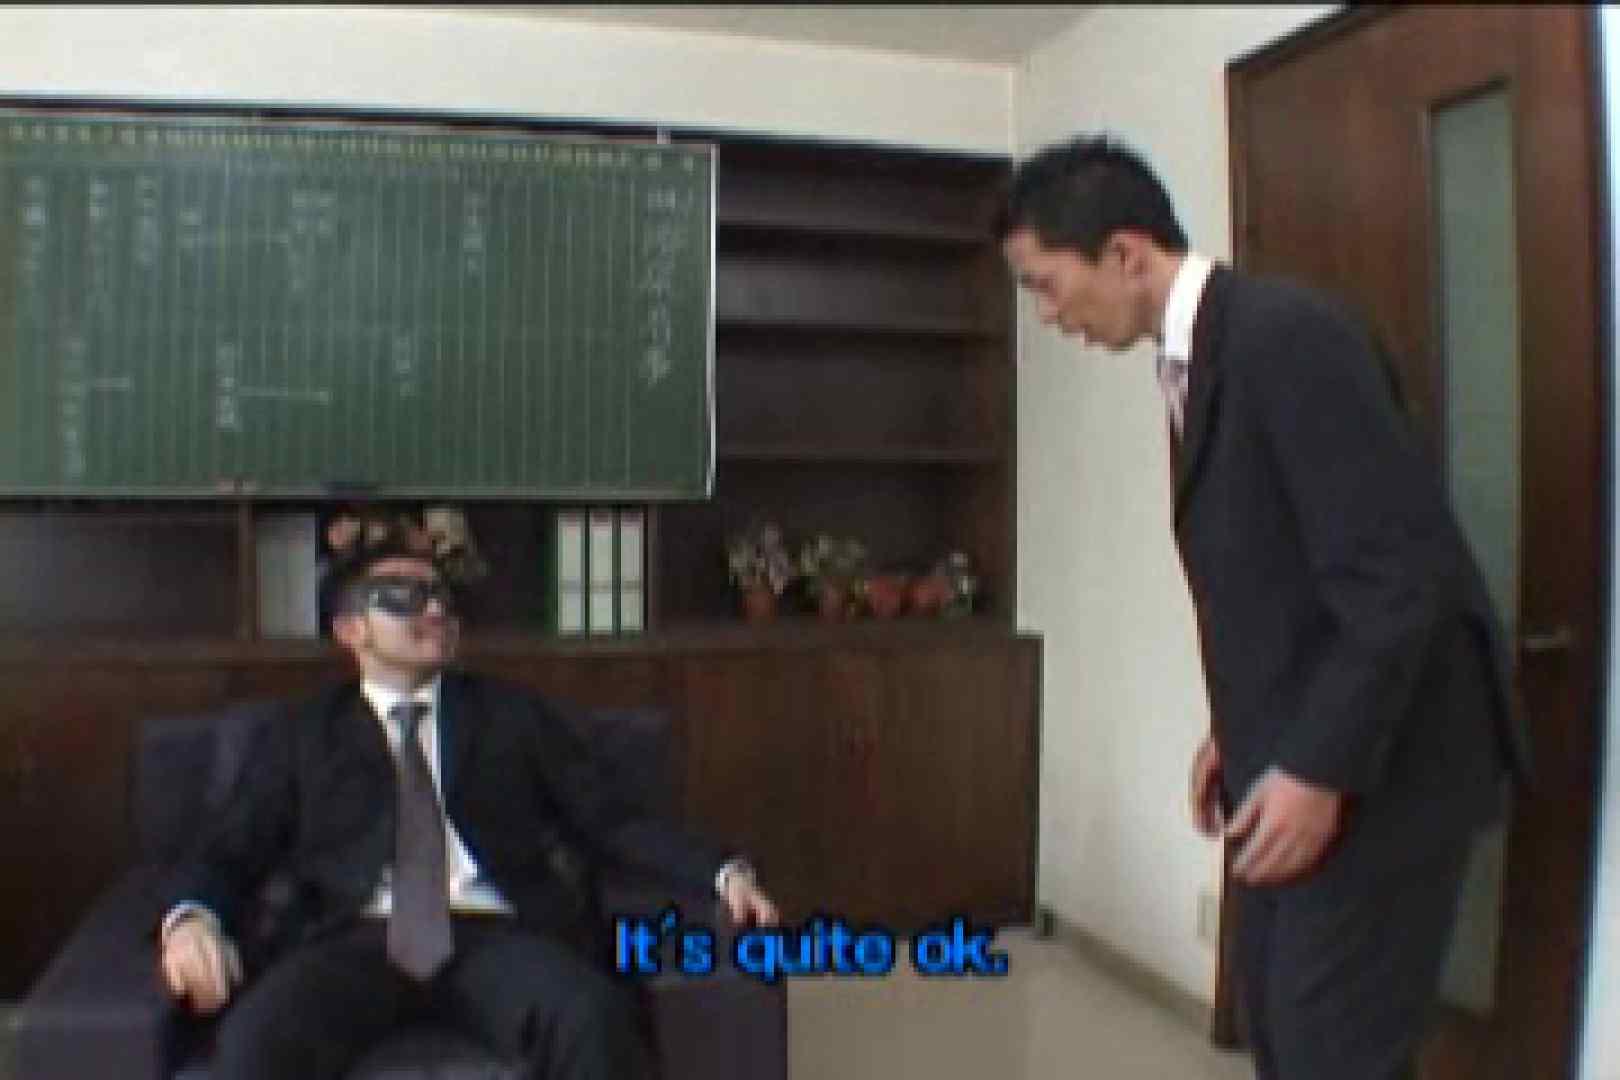 怒涛の集団攻撃!!vol.01 裸  77pic 1